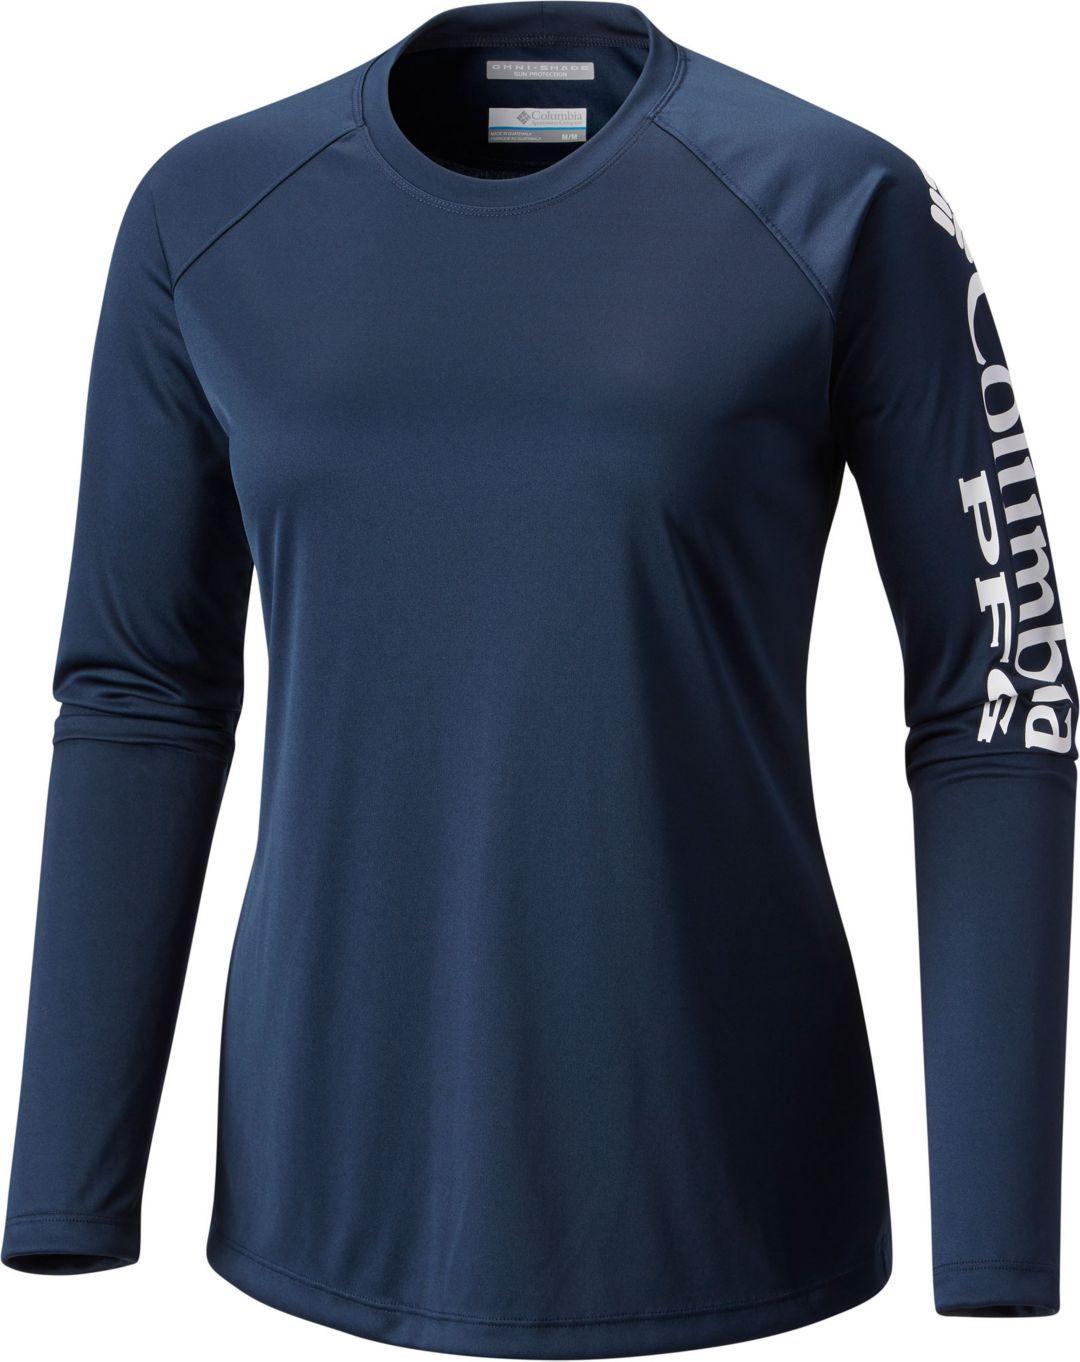 05ffa590 Columbia Women's PFG Tidal Tee II Long Sleeve Shirt | DICK'S ...